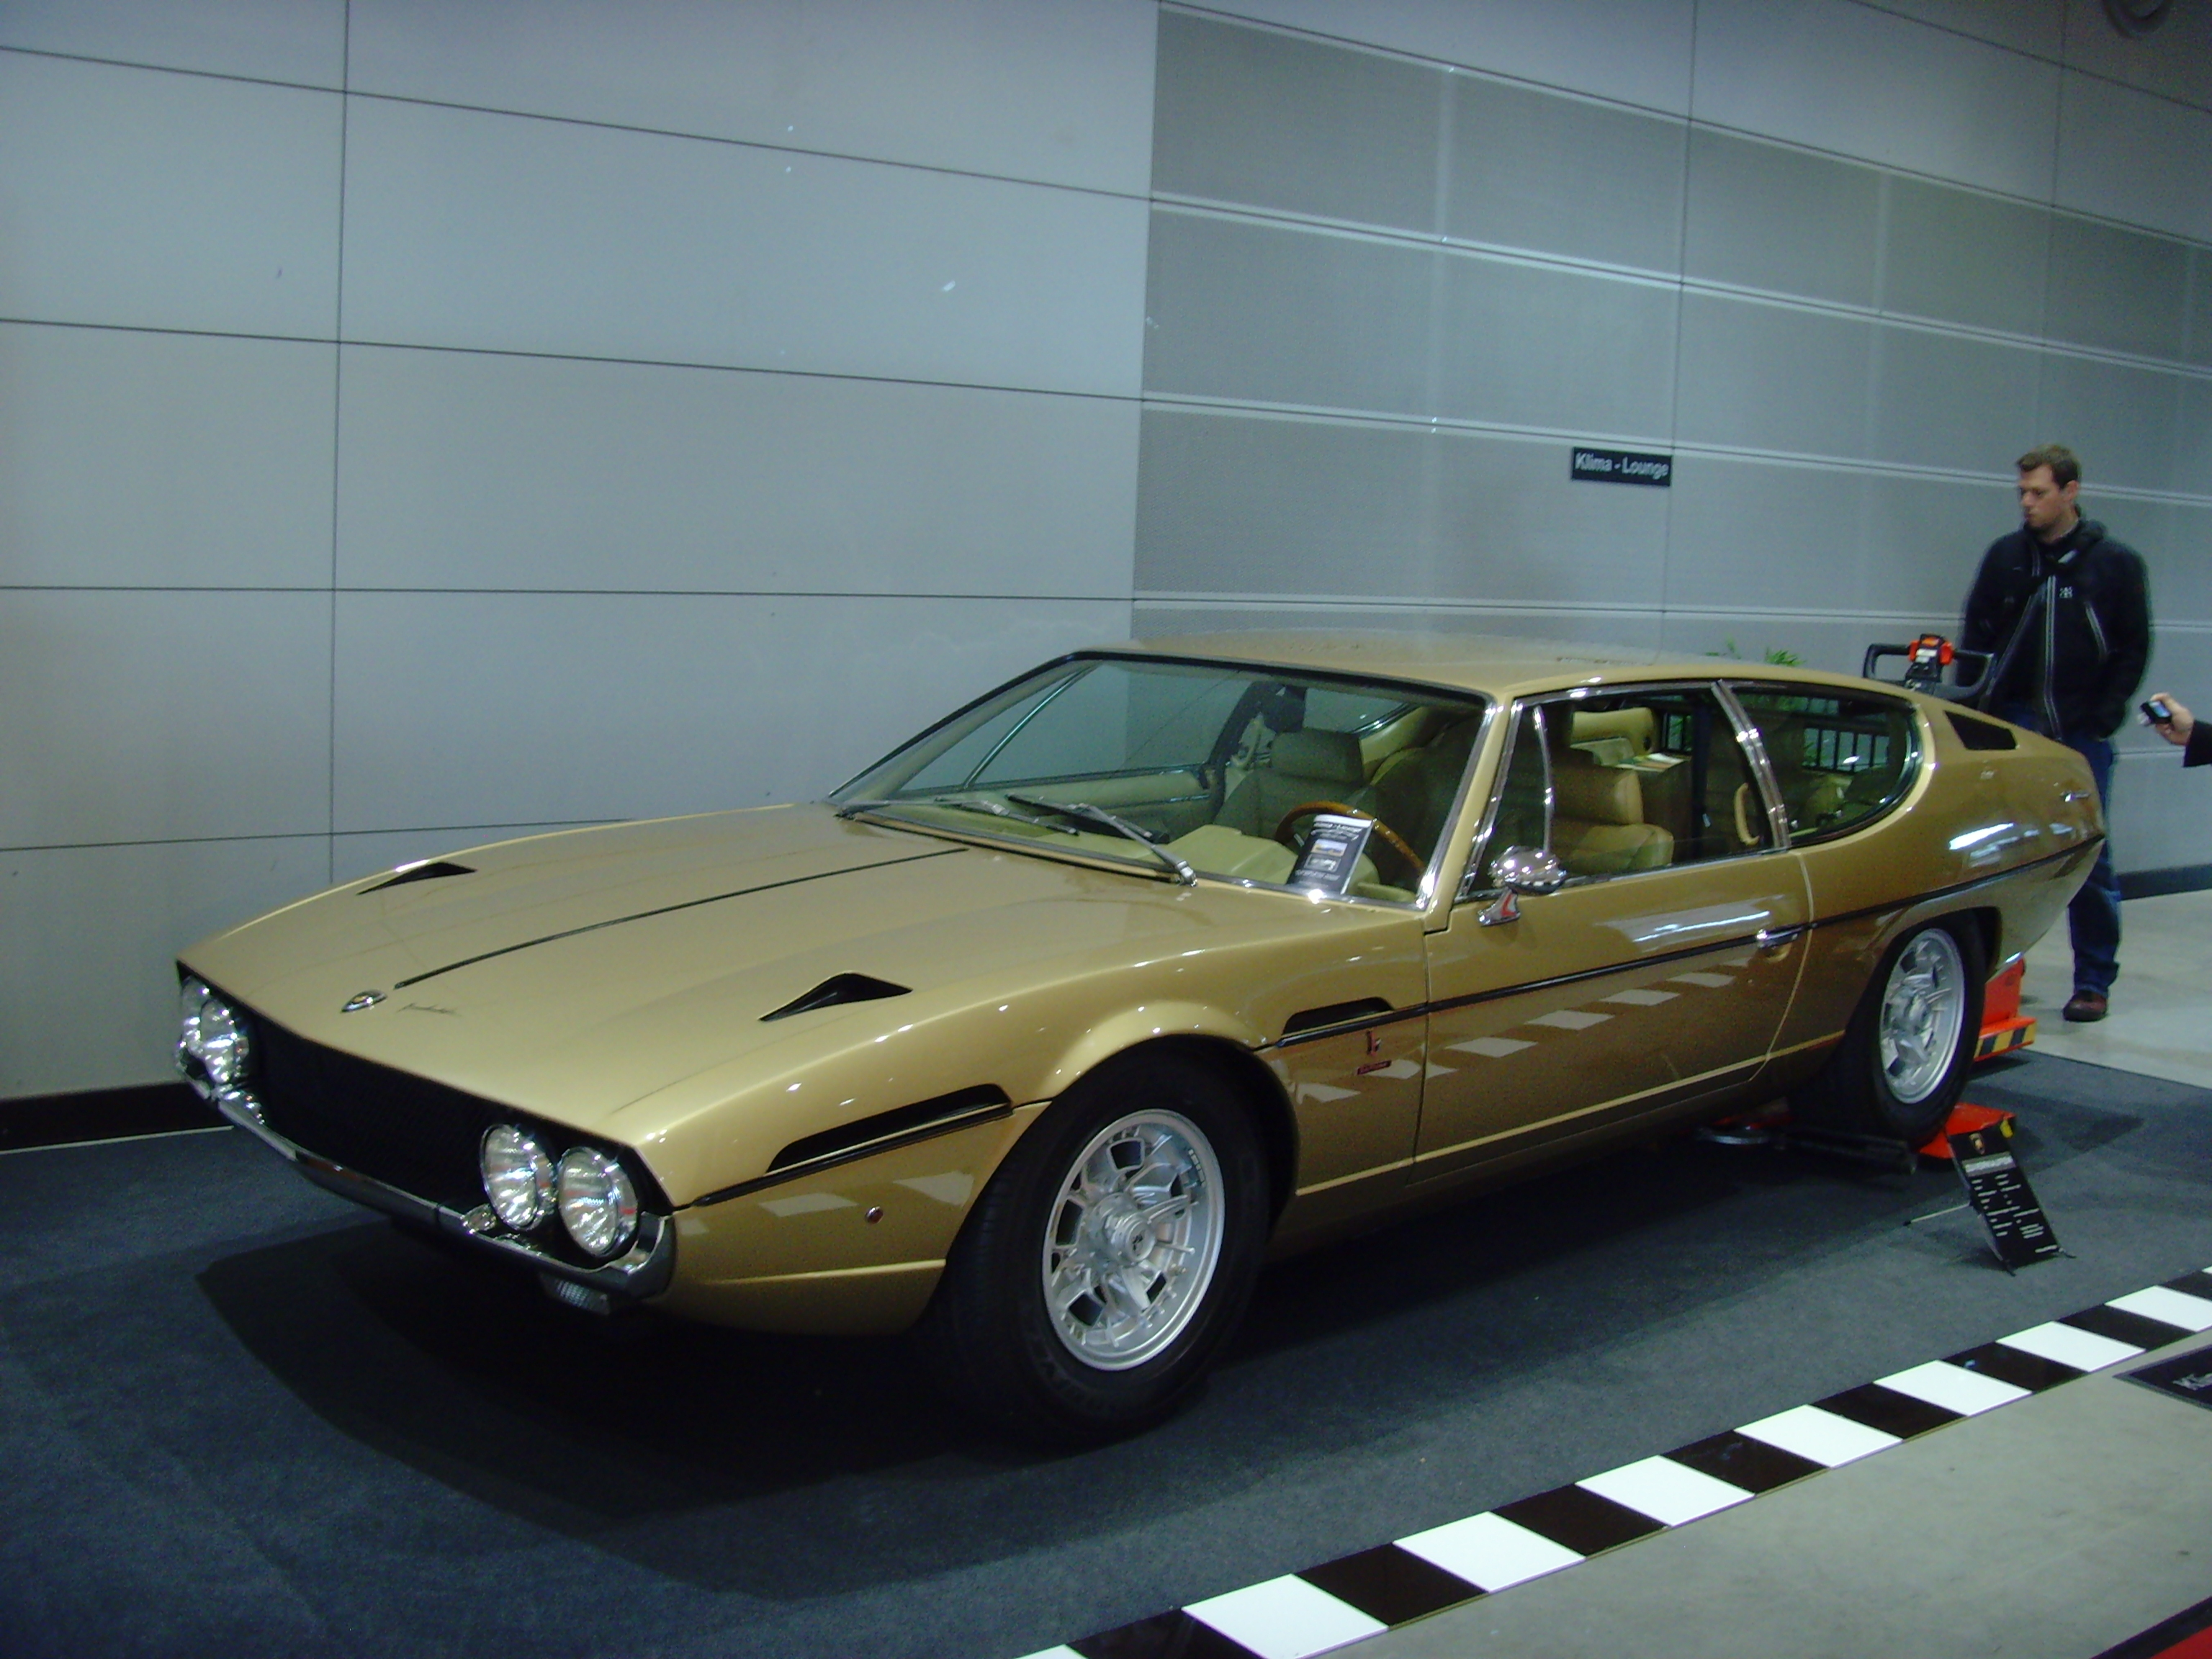 http://carsot.com/images/lamborghini-espada-1968-1981-coupe-exterior.jpg